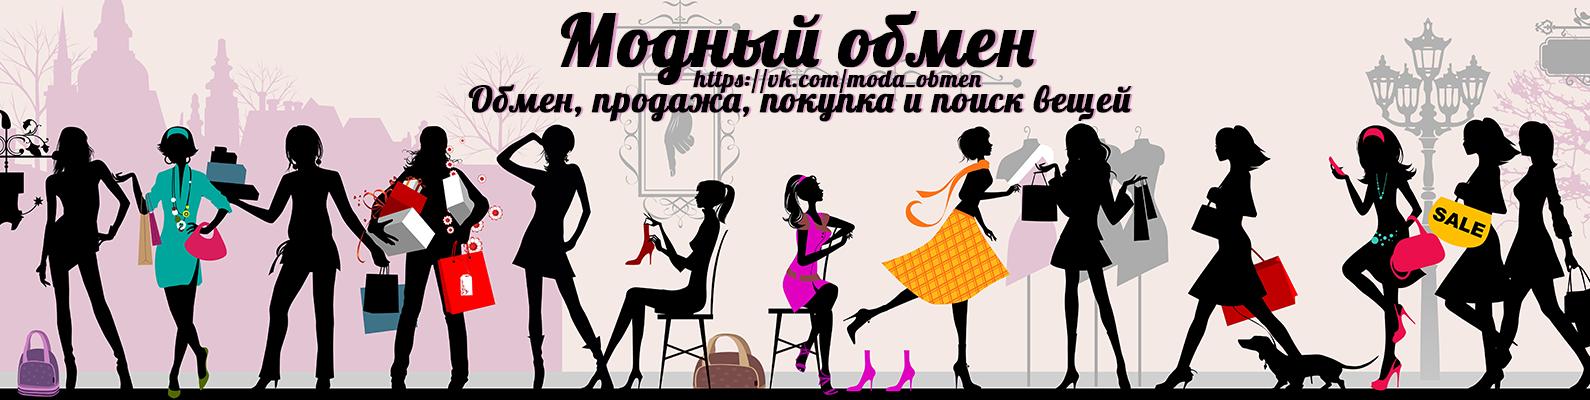 http://images.vfl.ru/ii/1500190550/6025ba05/17937897.png